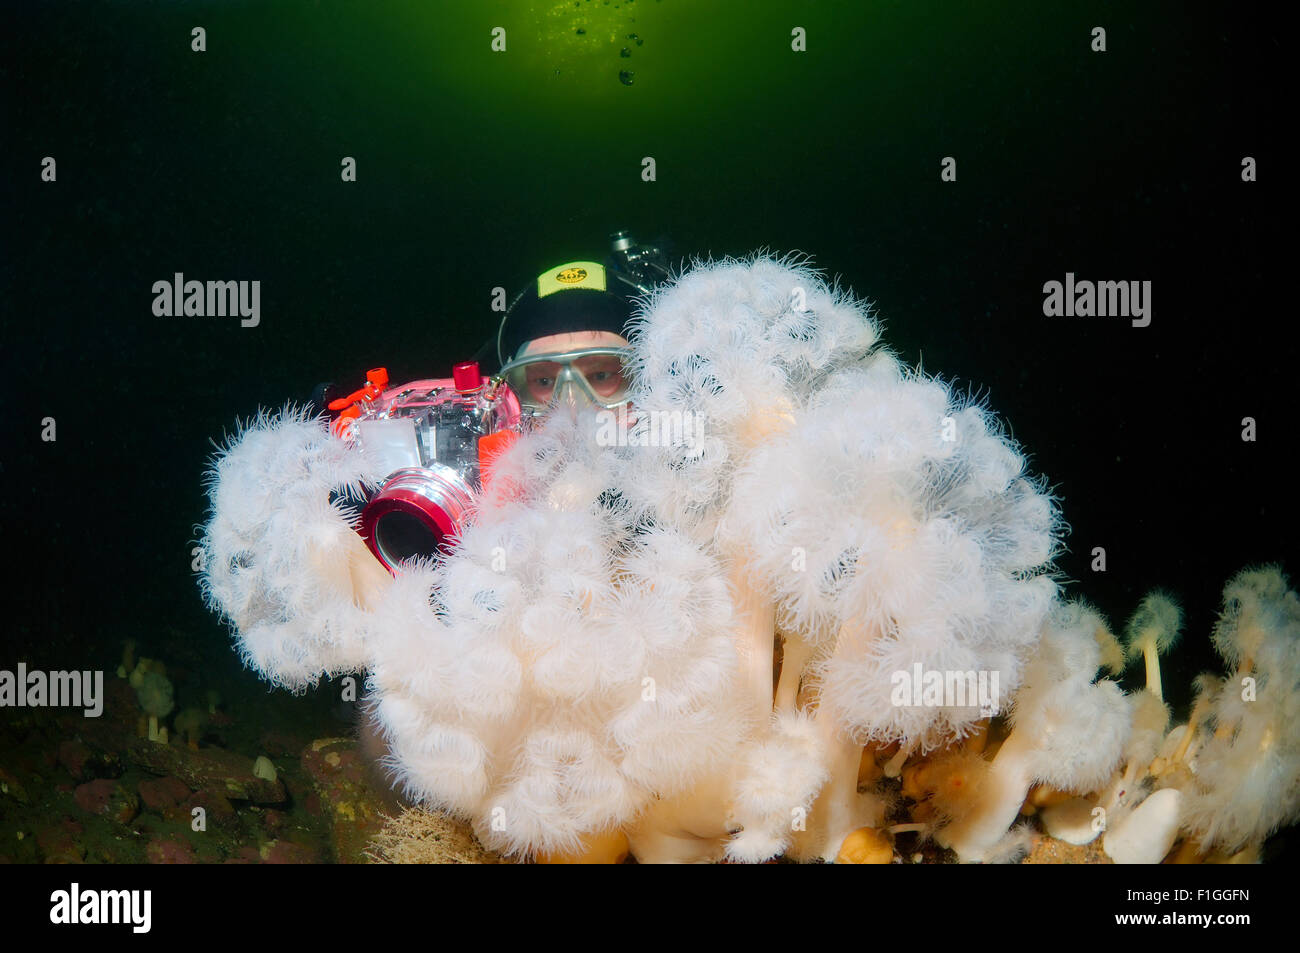 Oct. 15, 2014 - White Sea, Arctic, Russia - Underwater photographr and plumose anemone or frilled anemone, (Metridium Stock Photo